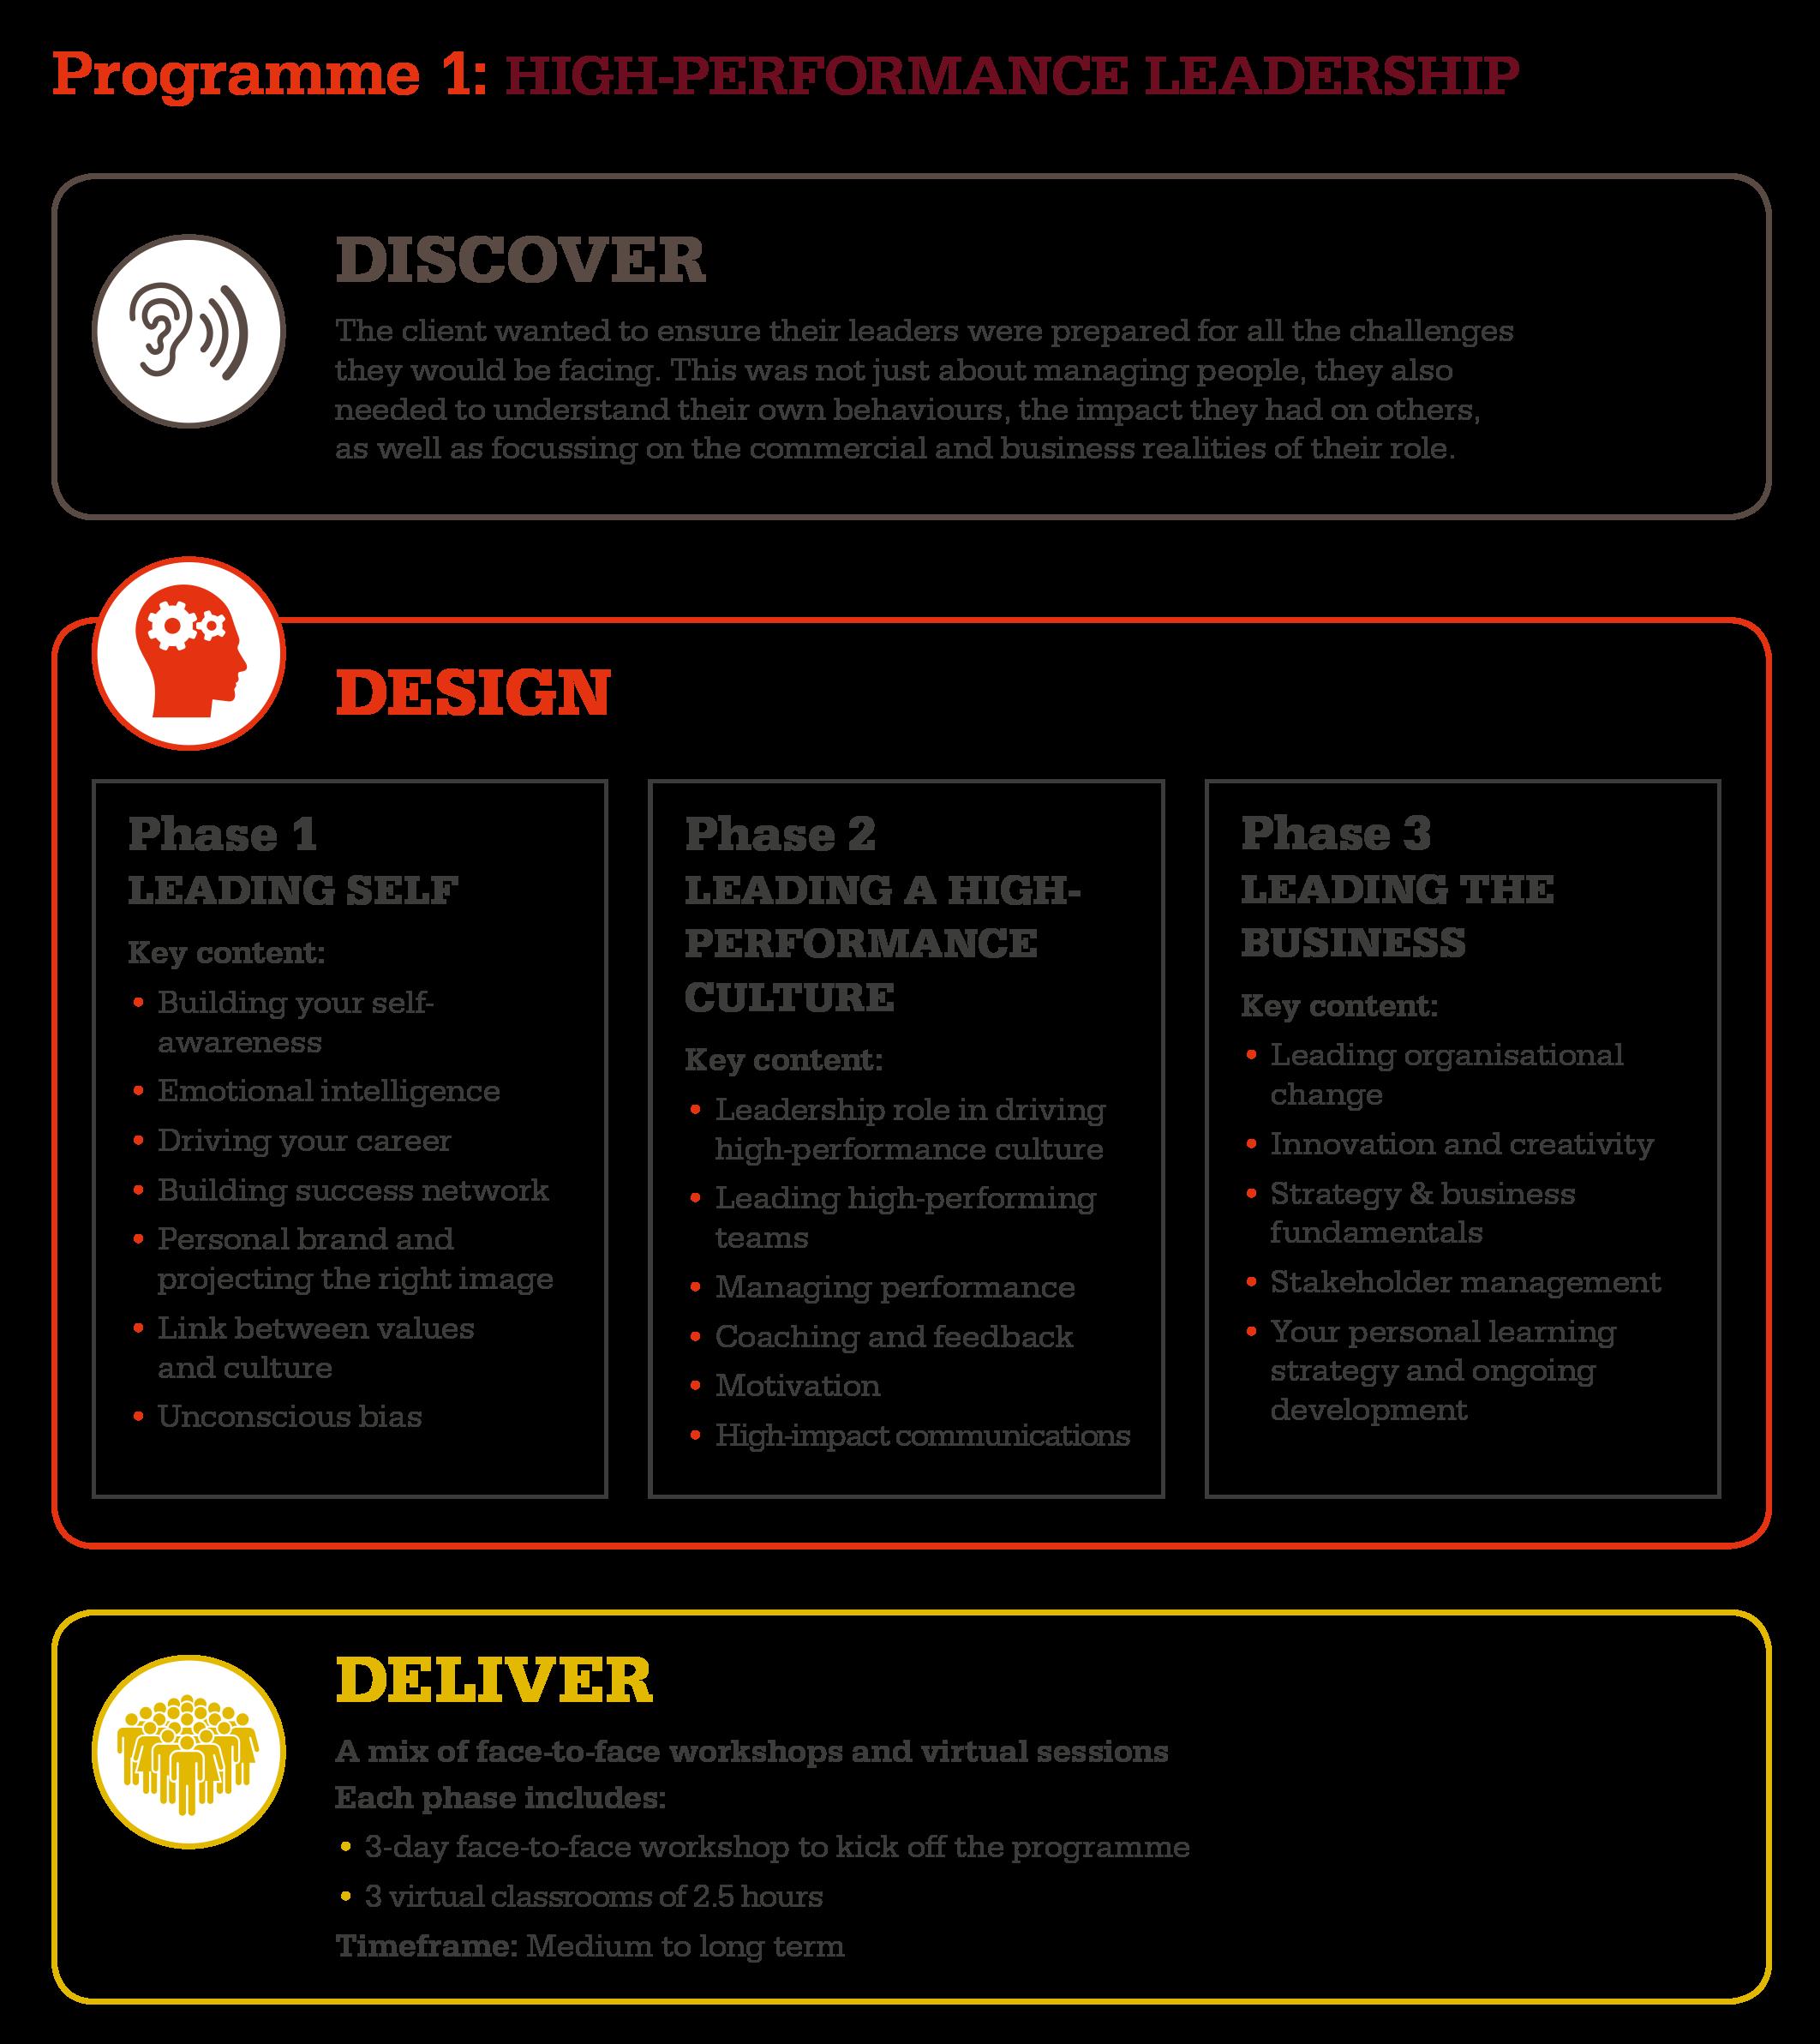 Bespoke programme 1 - High-performance leadership